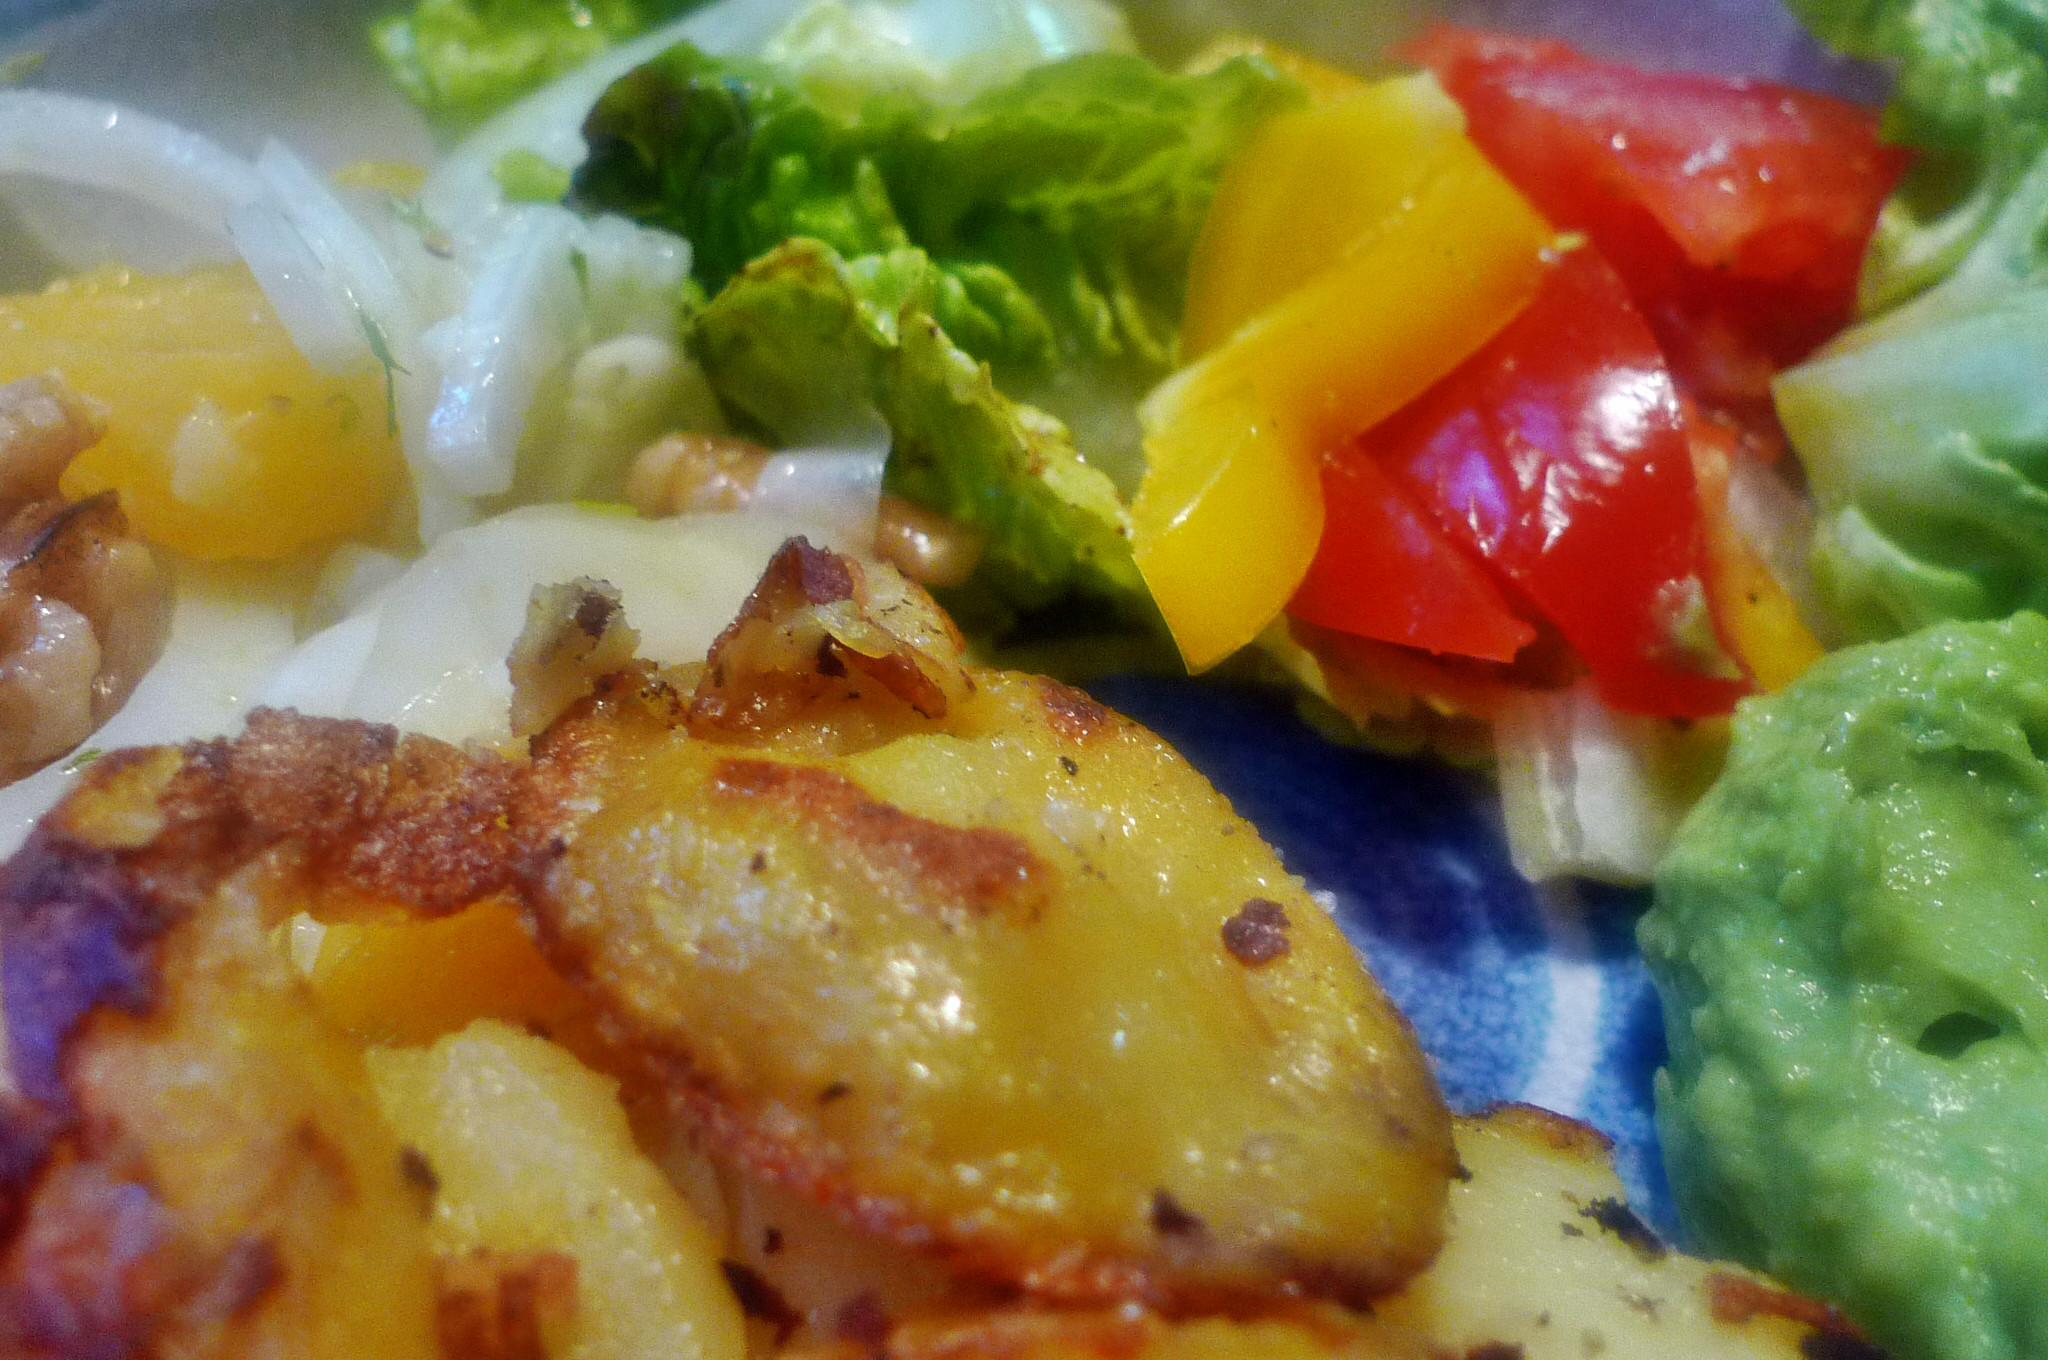 Guacamole,Fenchelsalat,Salat,Bratkartoffel--22.1.15   (14)